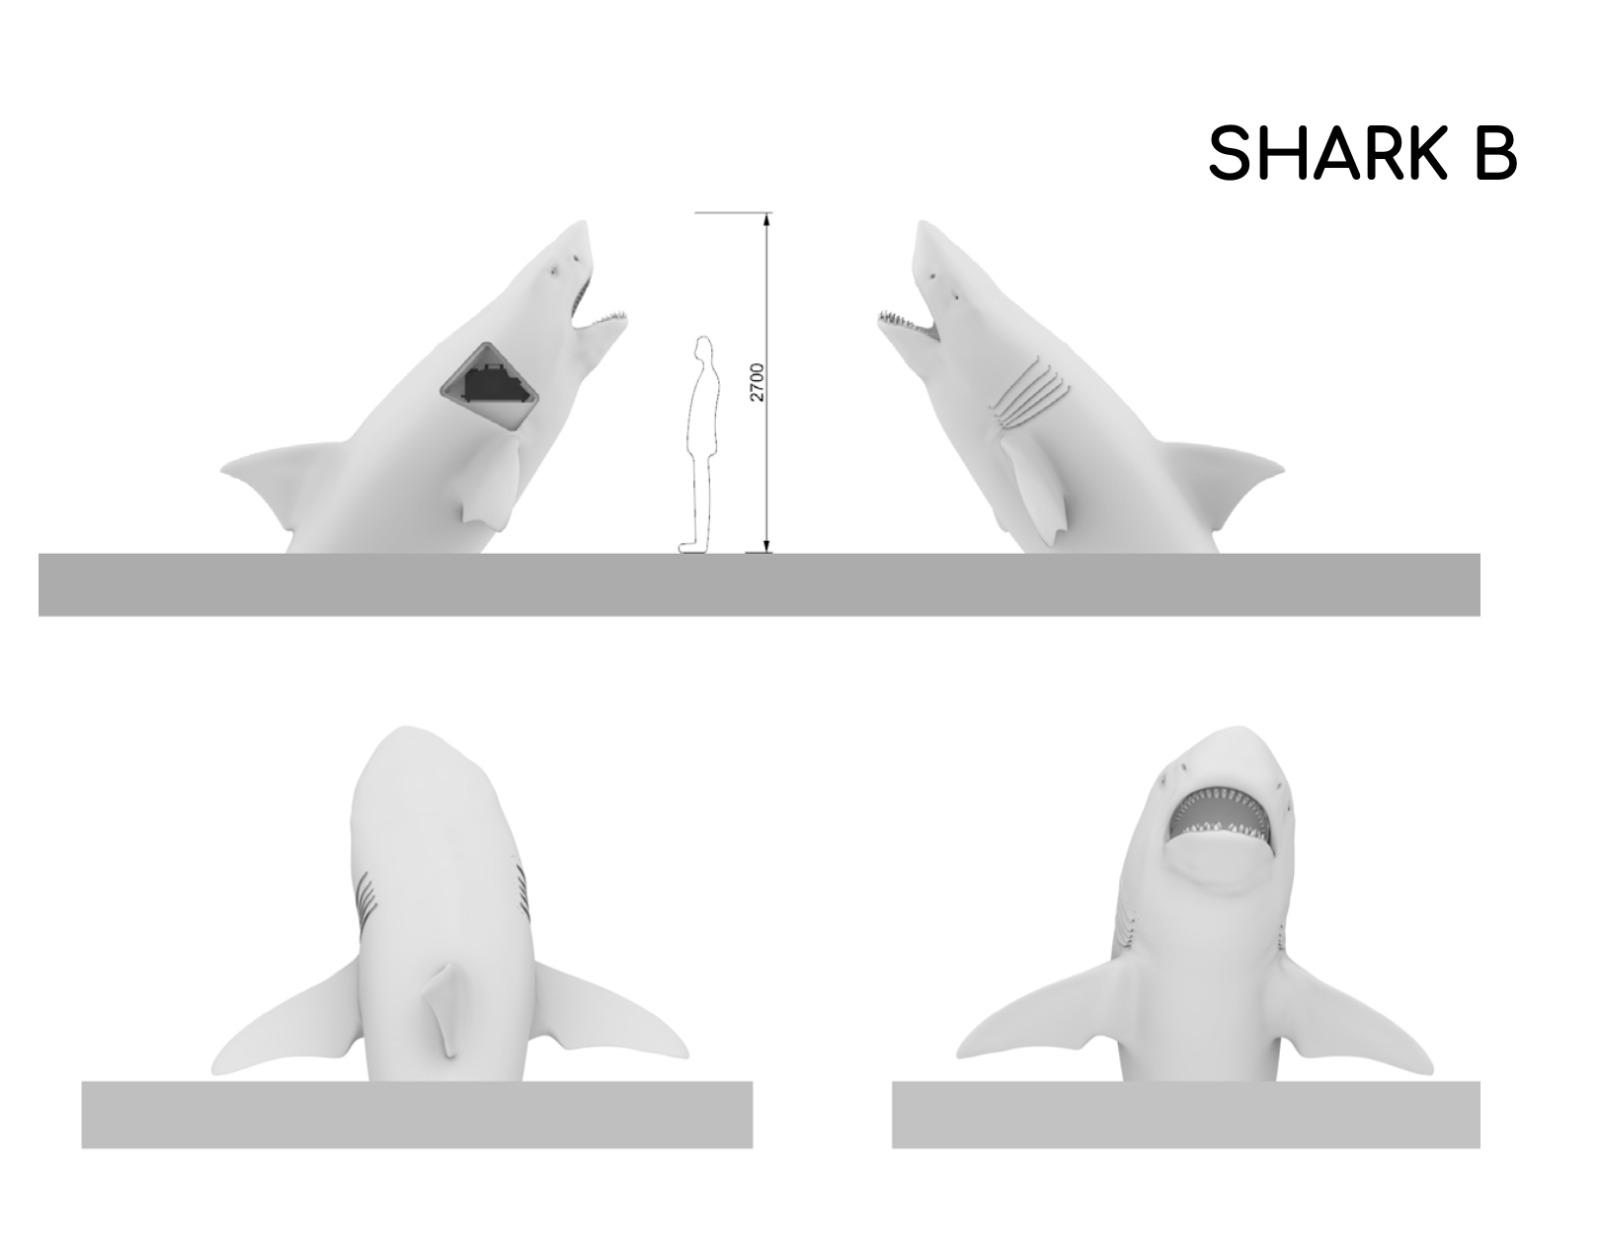 Megalodon shark dimensions